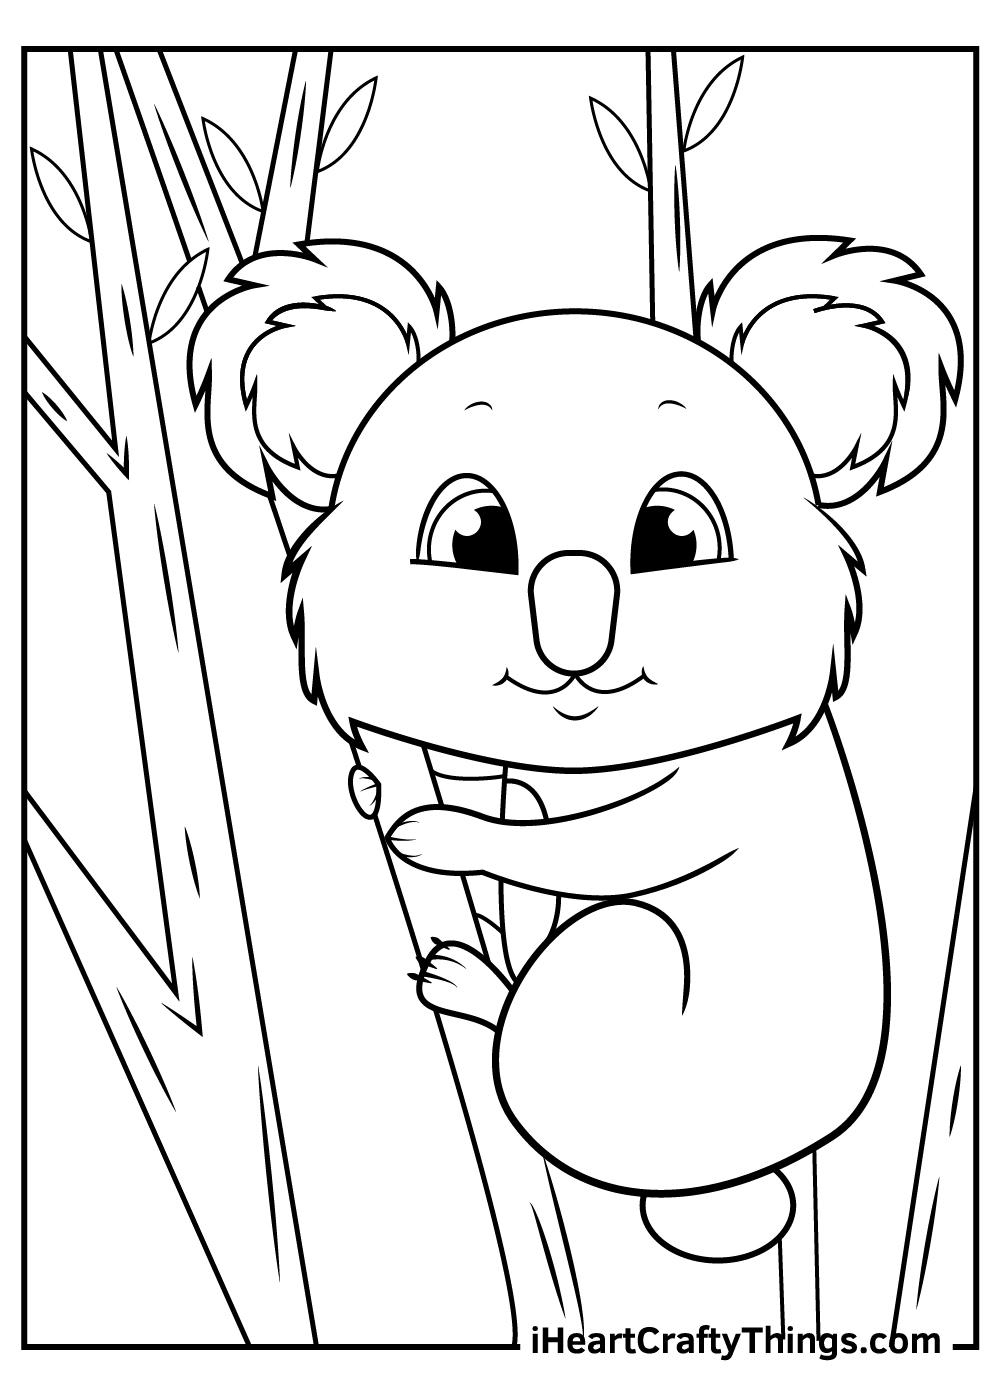 cute koalas coloring sheets for kids